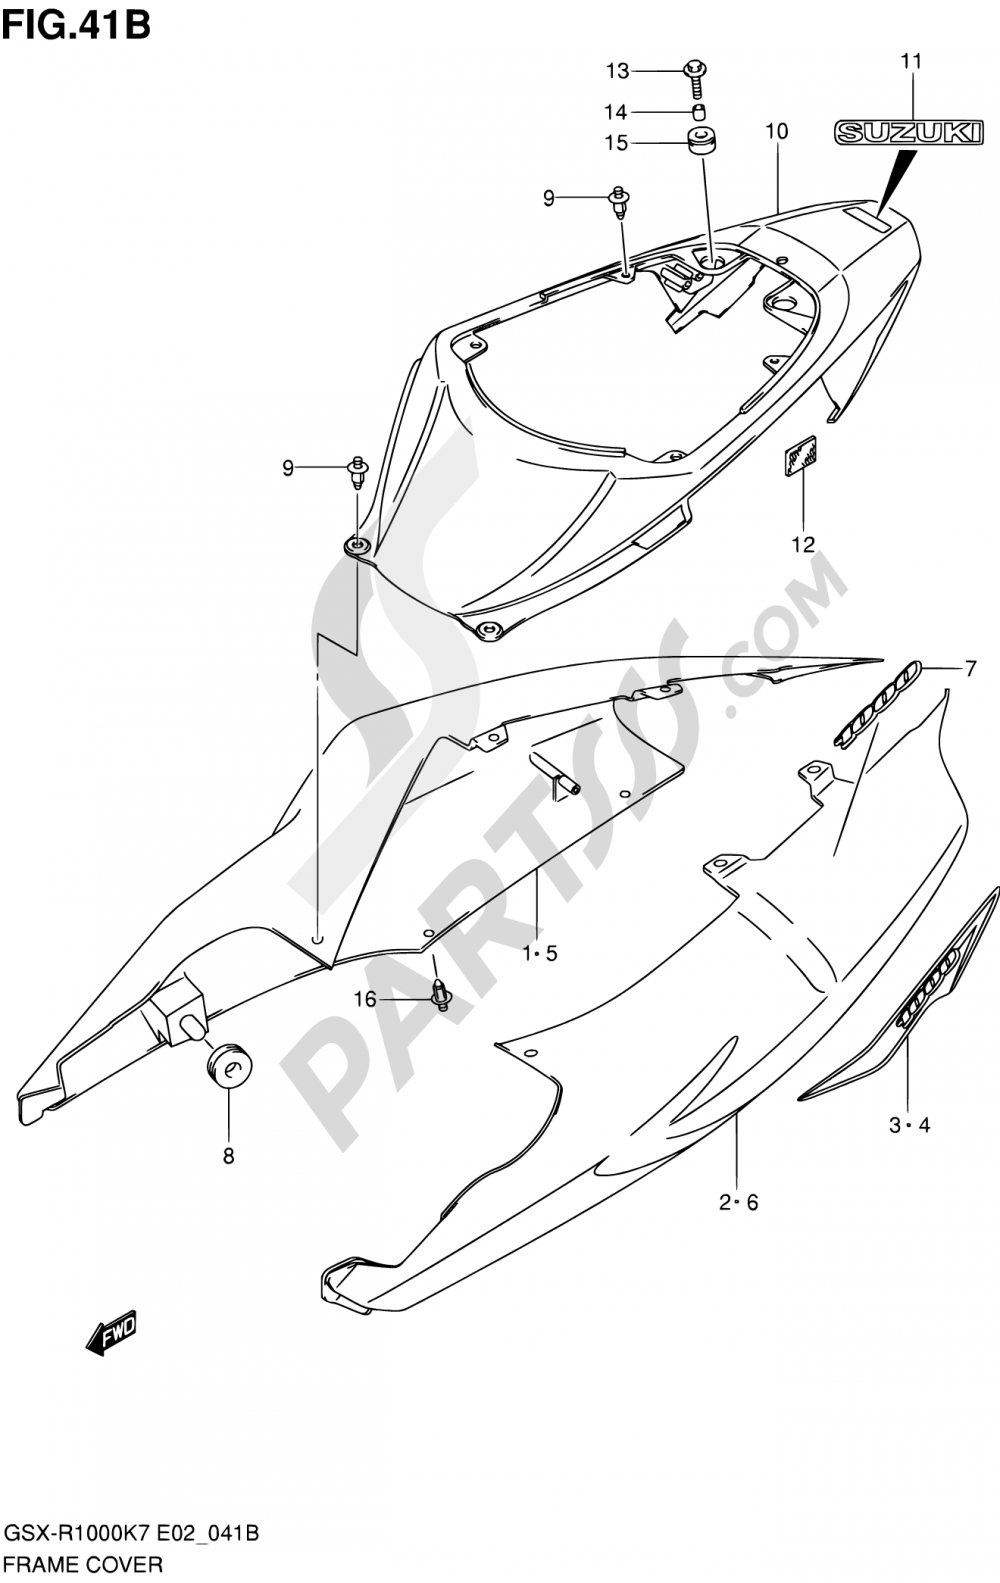 41B - FRAME COVER (GSX-R1000K8 E02,E19,E24,E51,P37) Suzuki GSX-R1000 2008